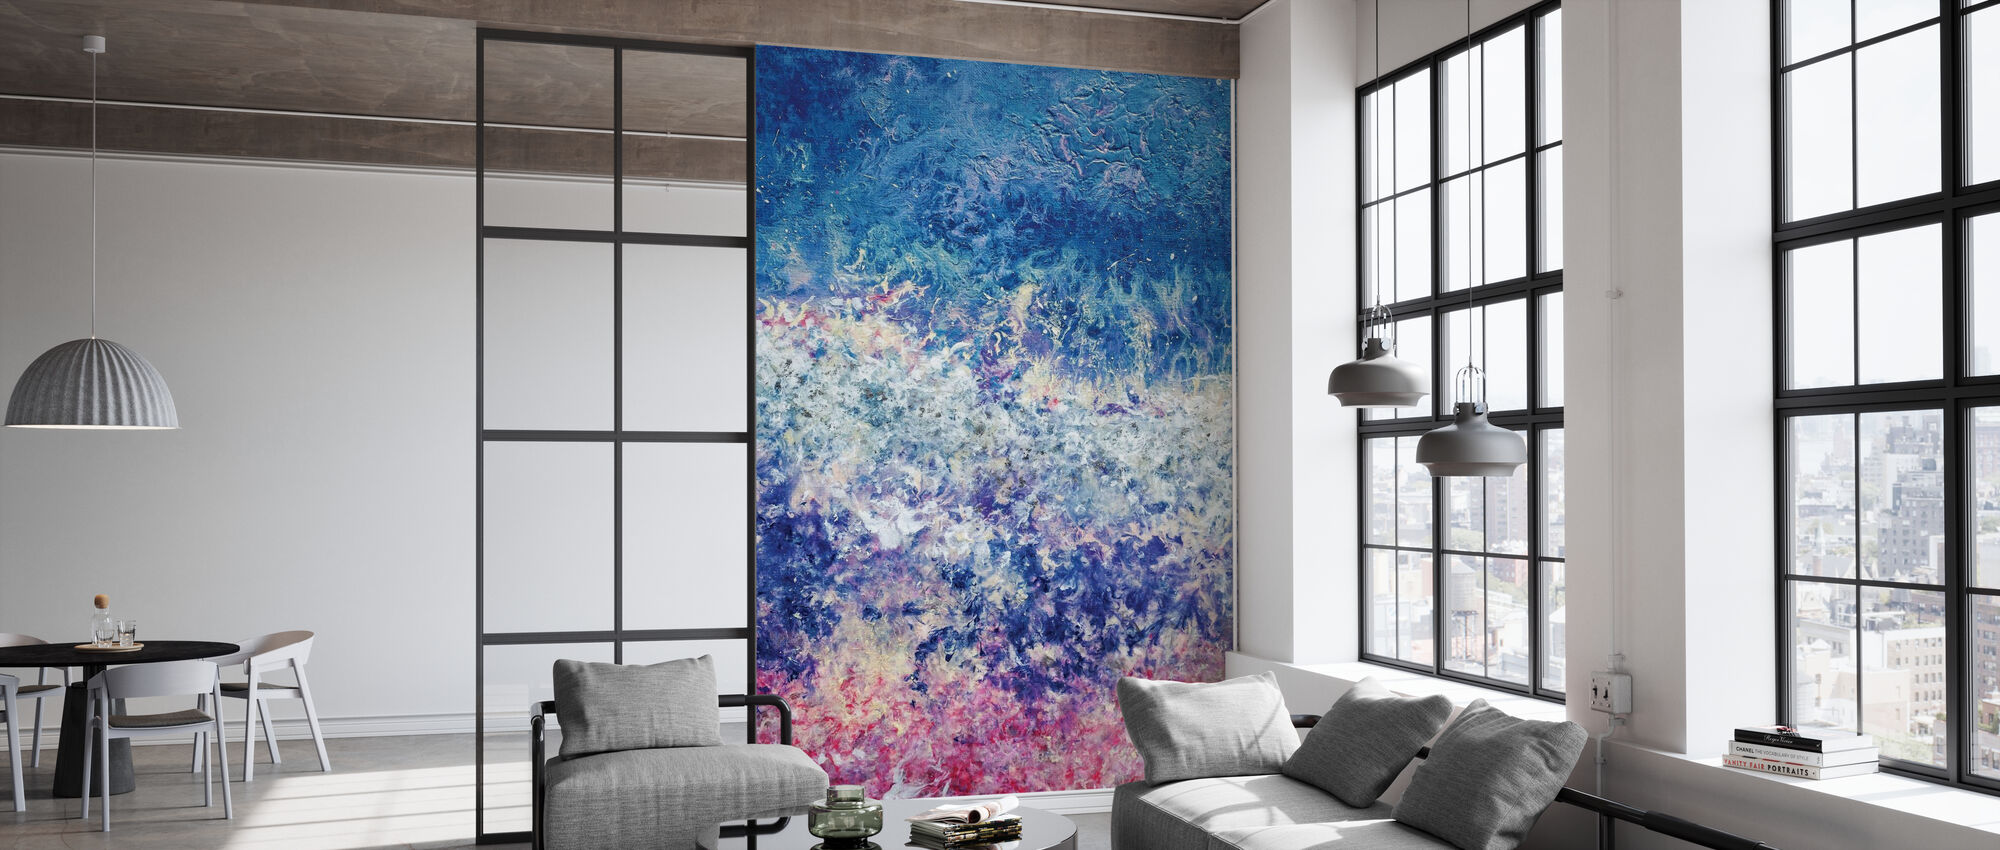 Twilight Tides - Wallpaper - Office